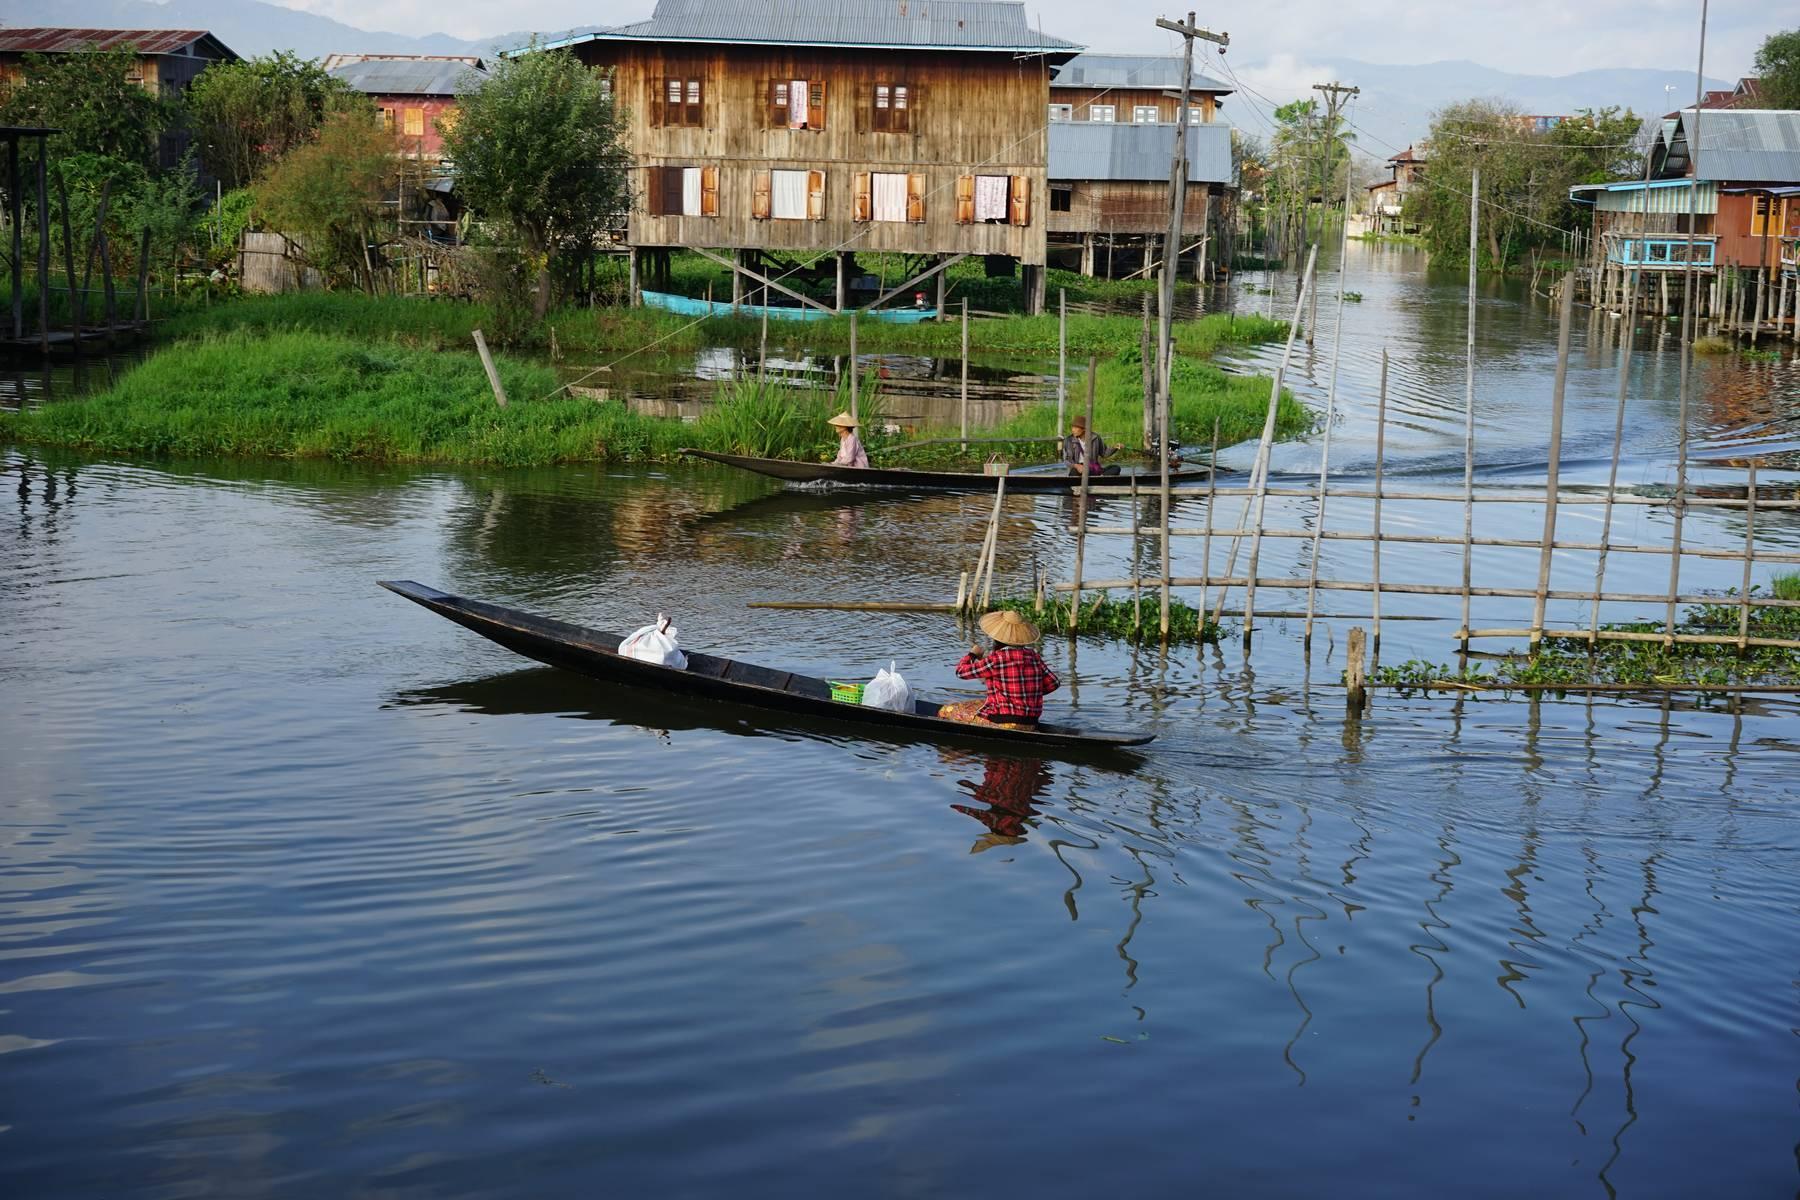 Voyage solidaire Birmanie : Vision du Monde - Photo 9